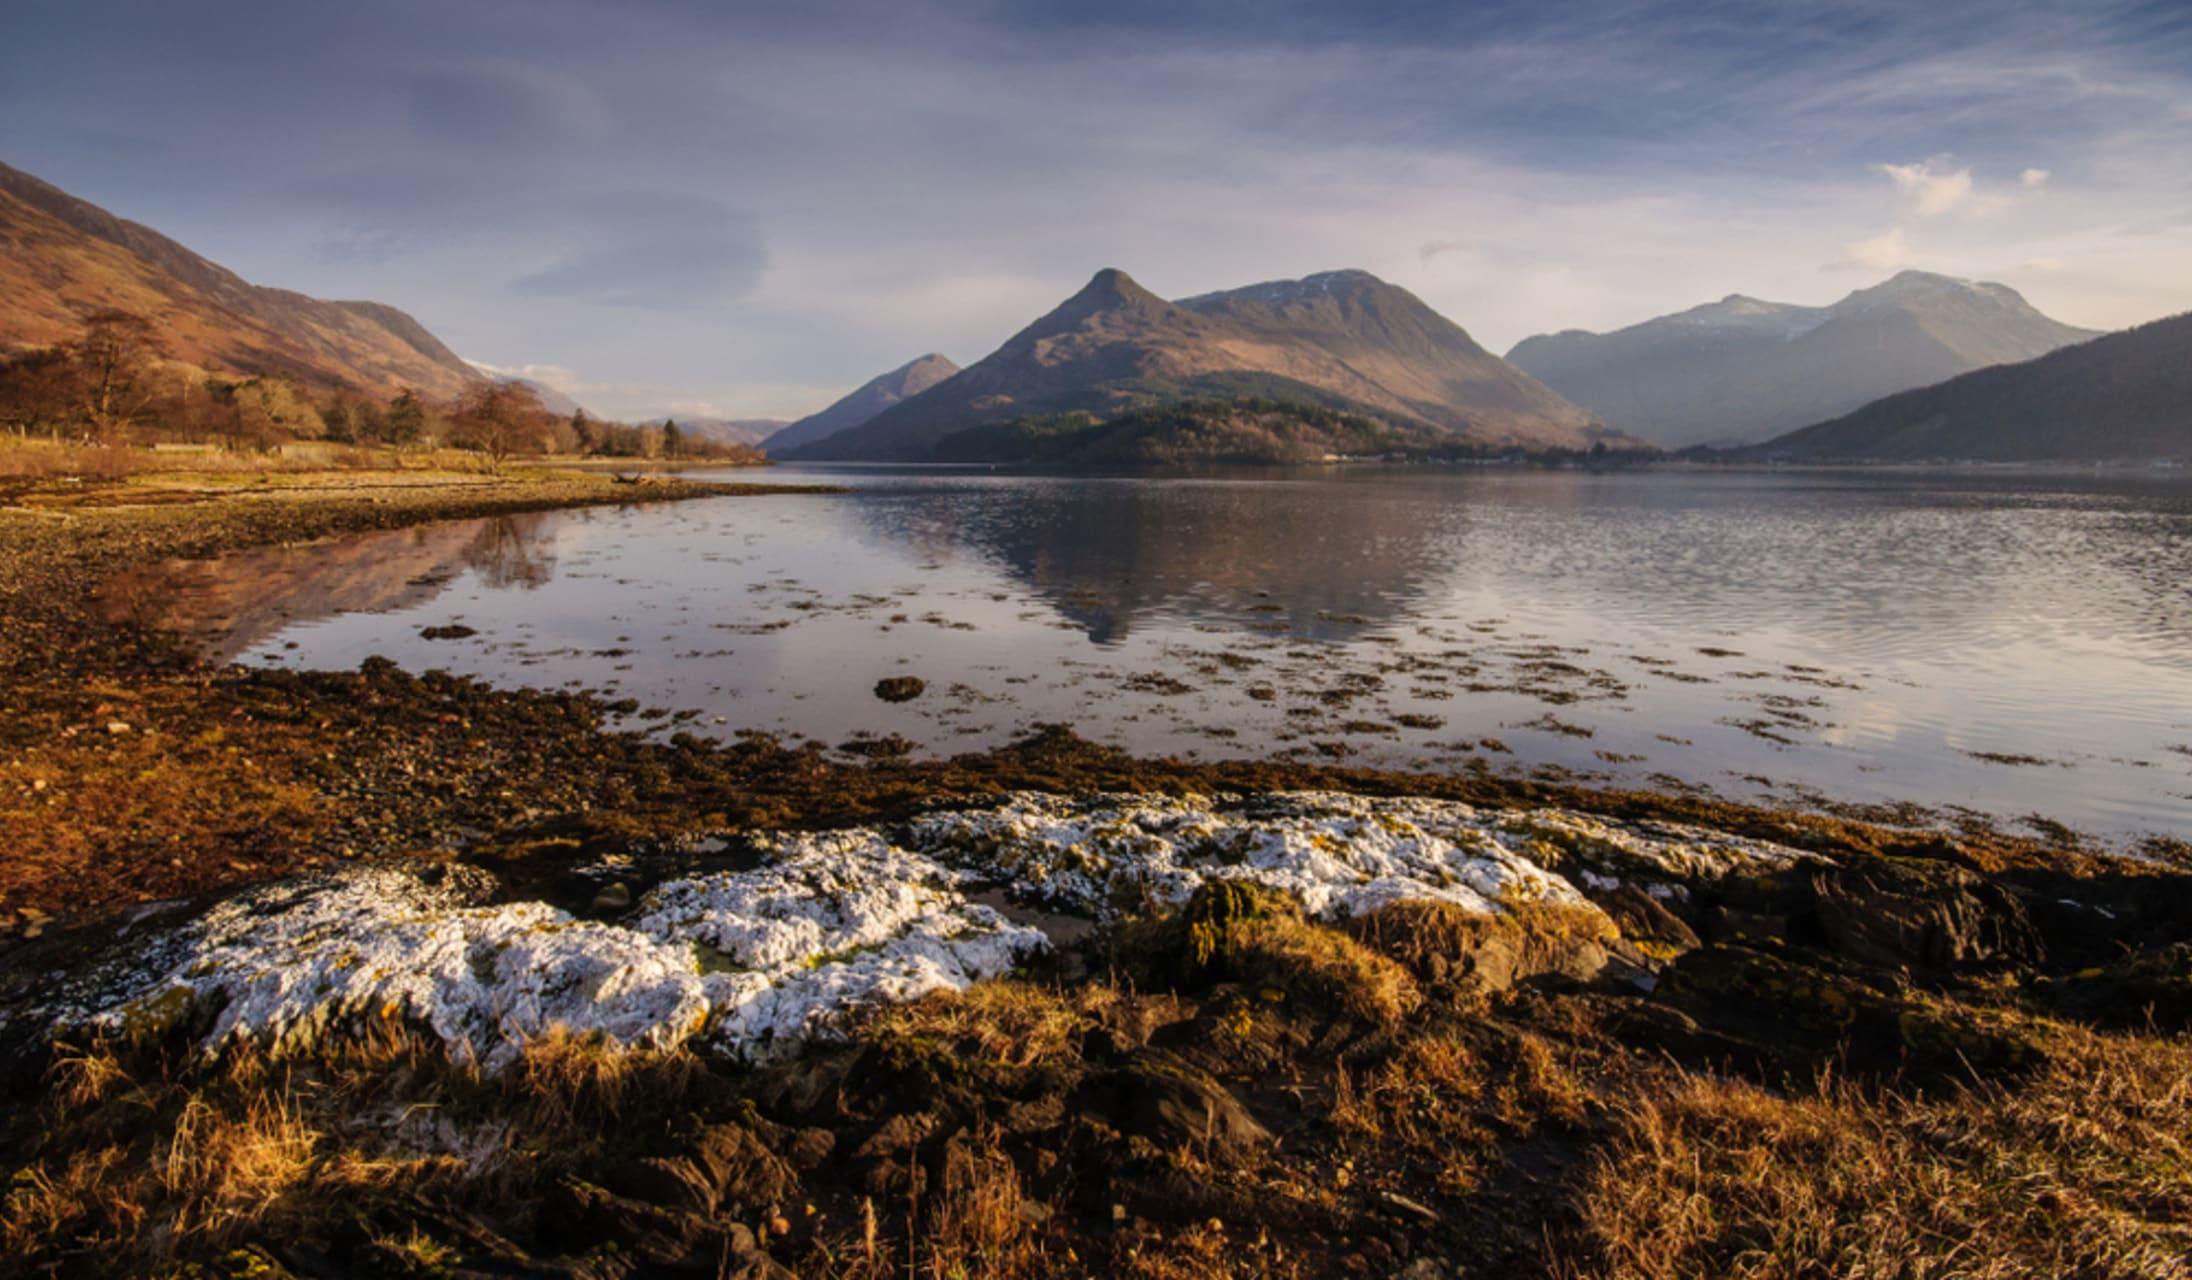 The Scottish Highlands - Glencoe: Climbing a Scottish Mountain